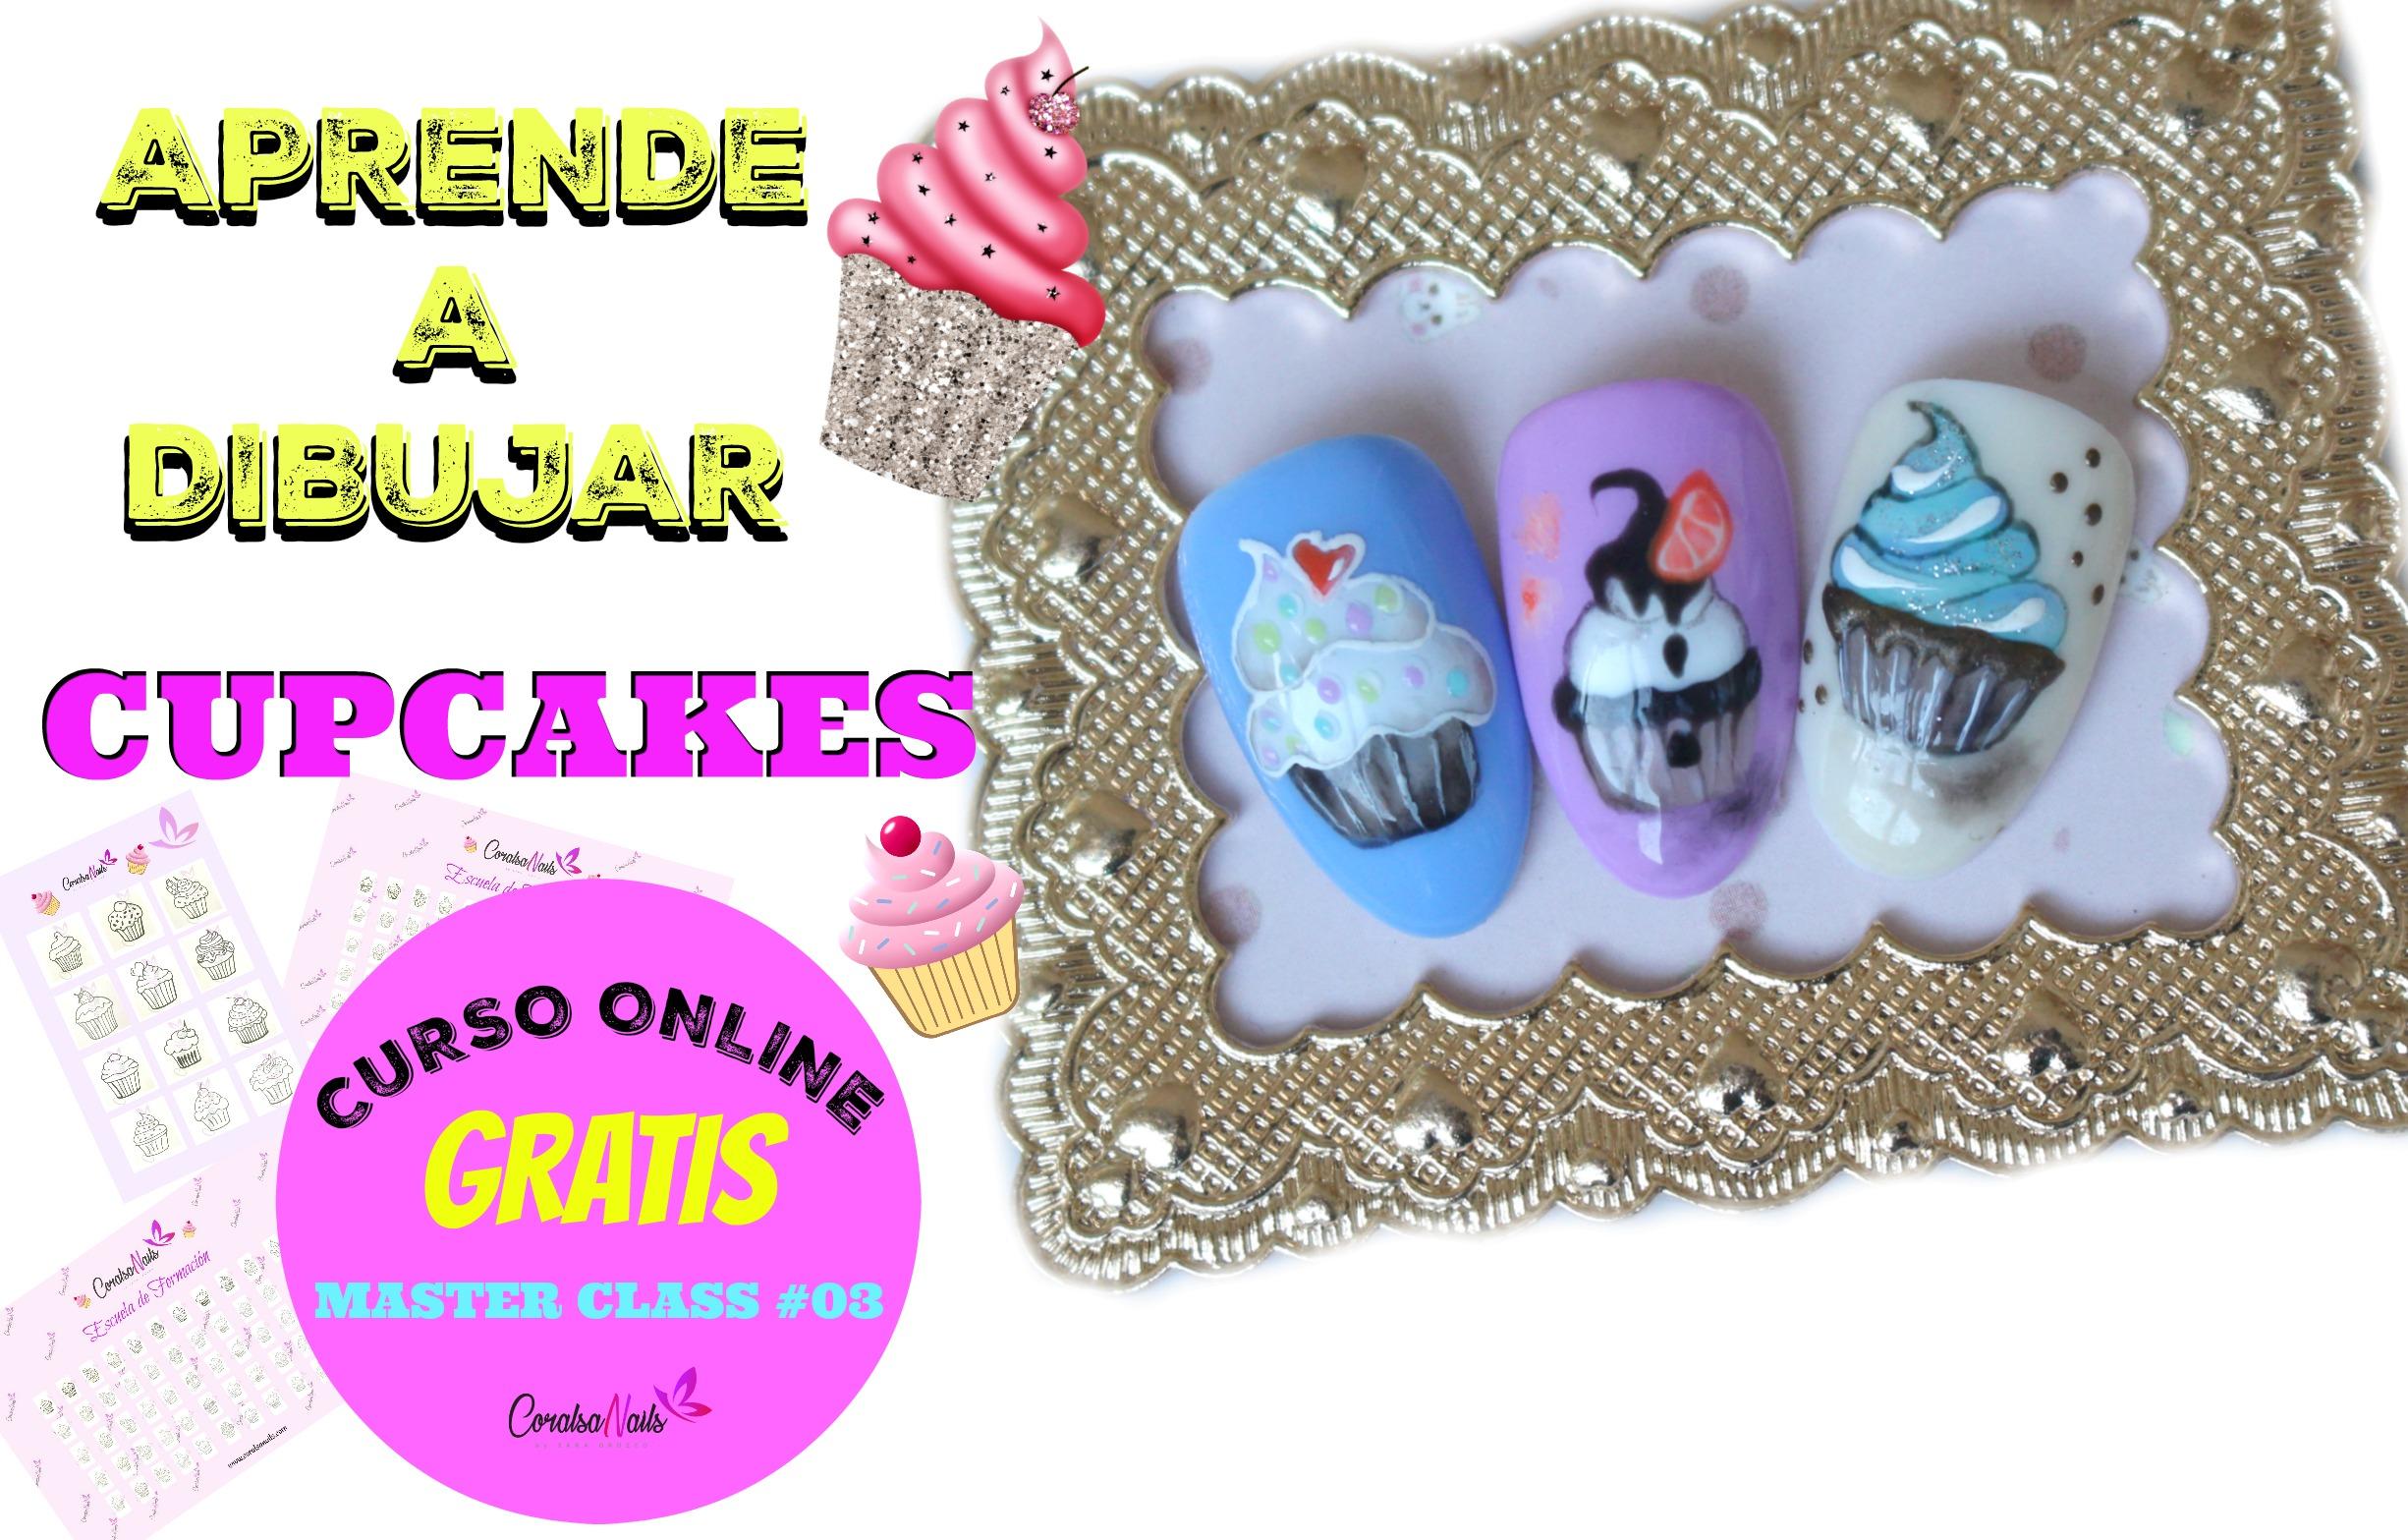 Curso Online Gratis de Uñas. Master Class #03